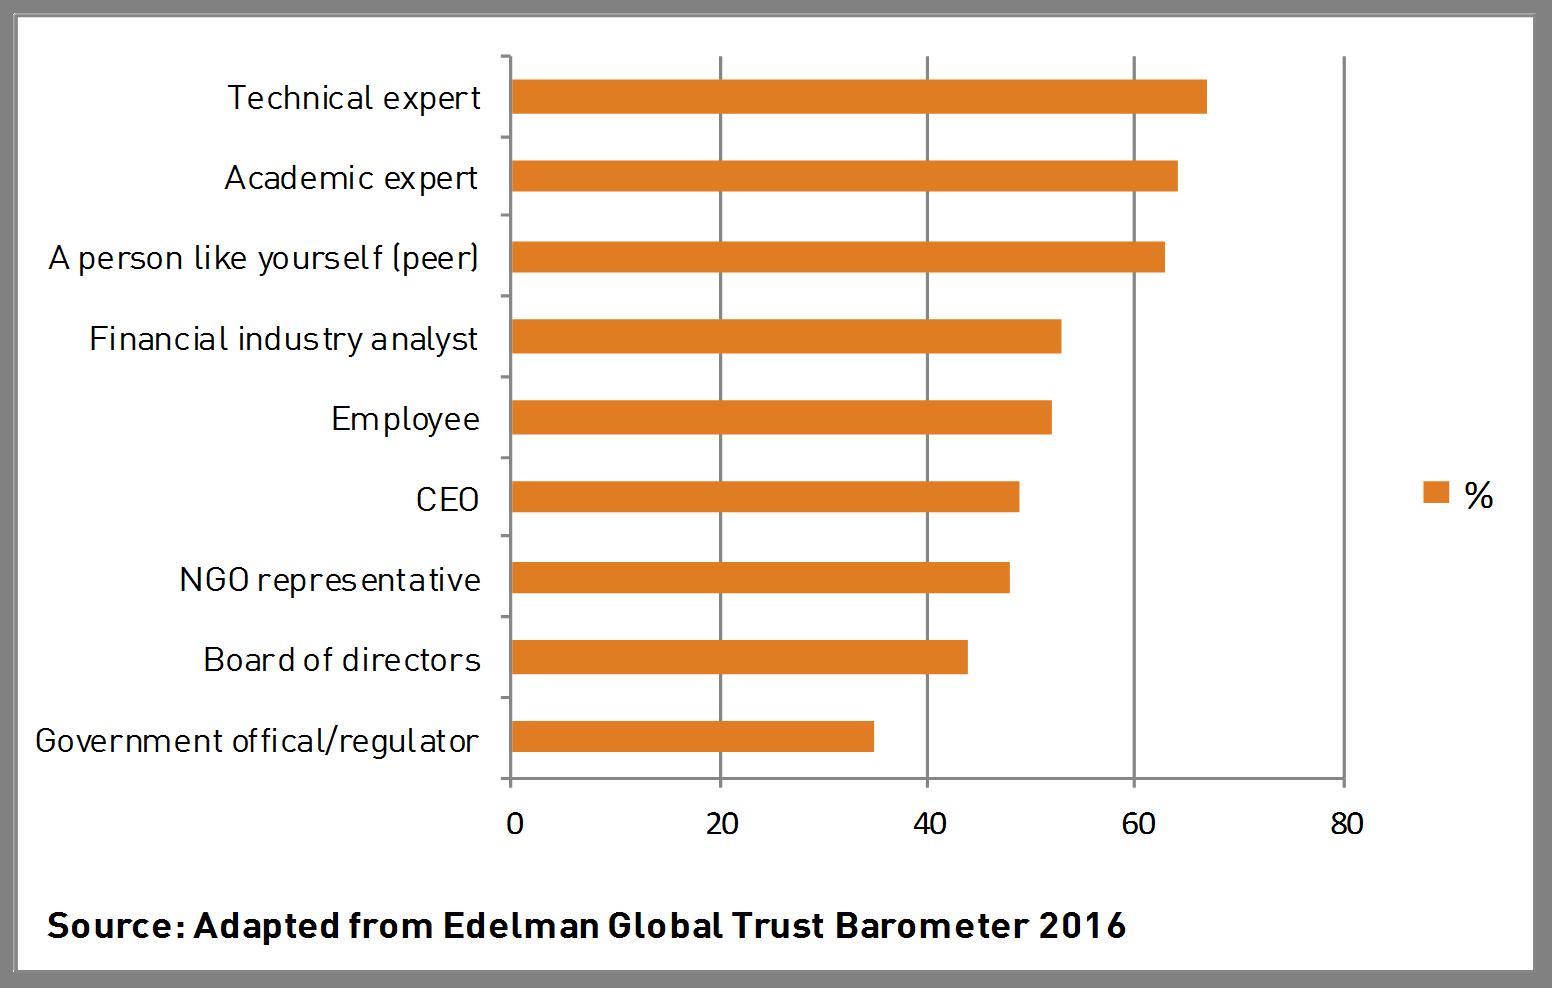 Source: Edelman Global Trust Barometer 2016